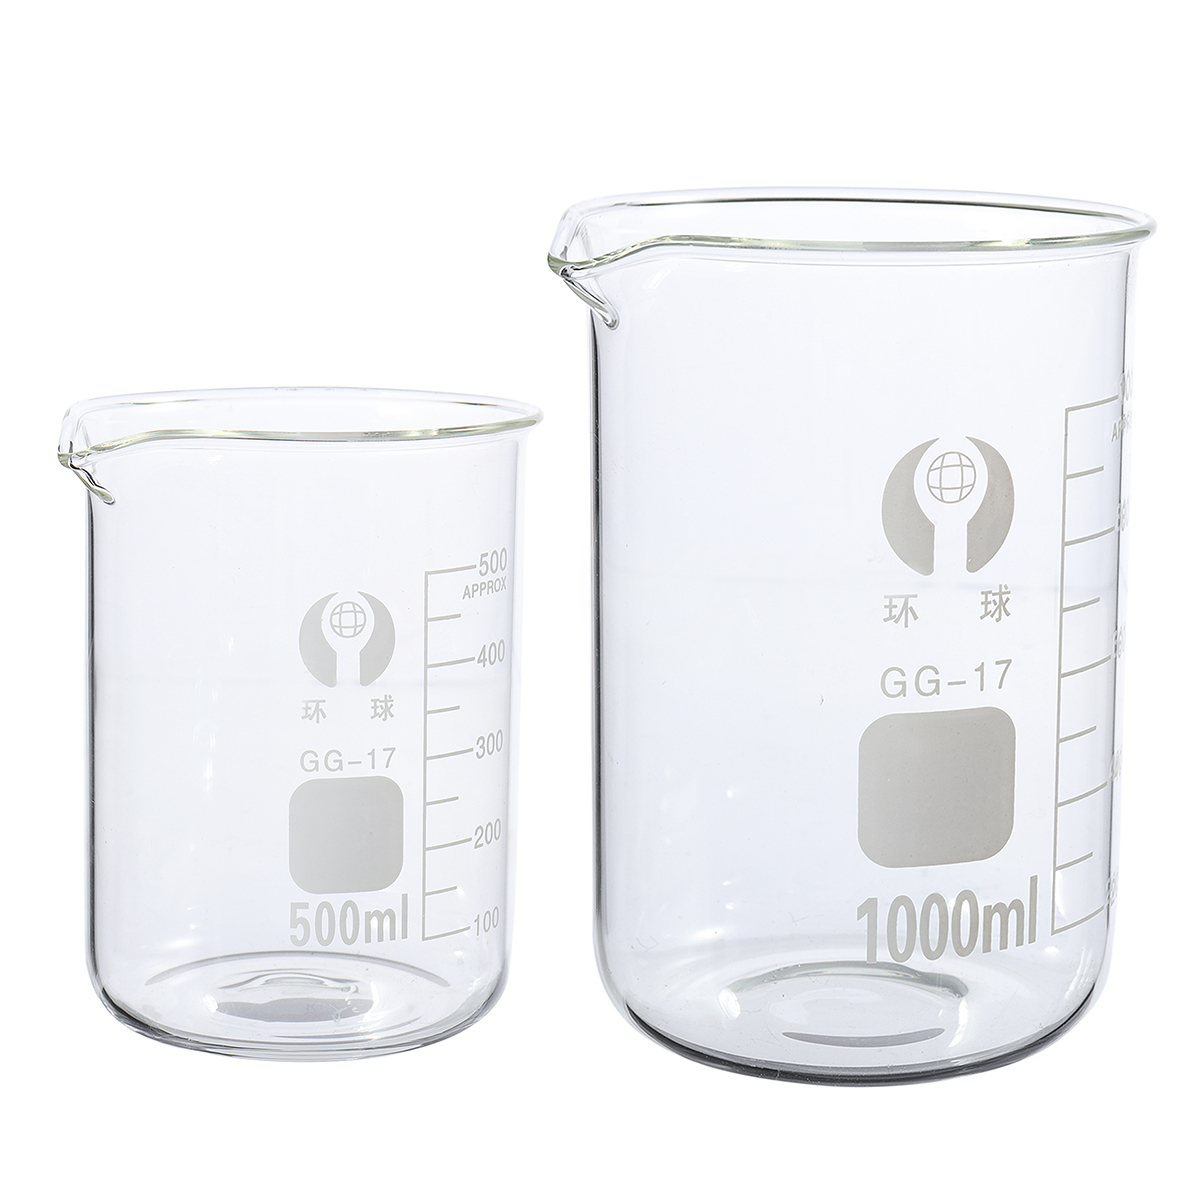 2Pcs 500ml 1000ml Beaker Set Graduated Borosilicate Glass Beaker Volumetric Measuring Laboratory Glassware